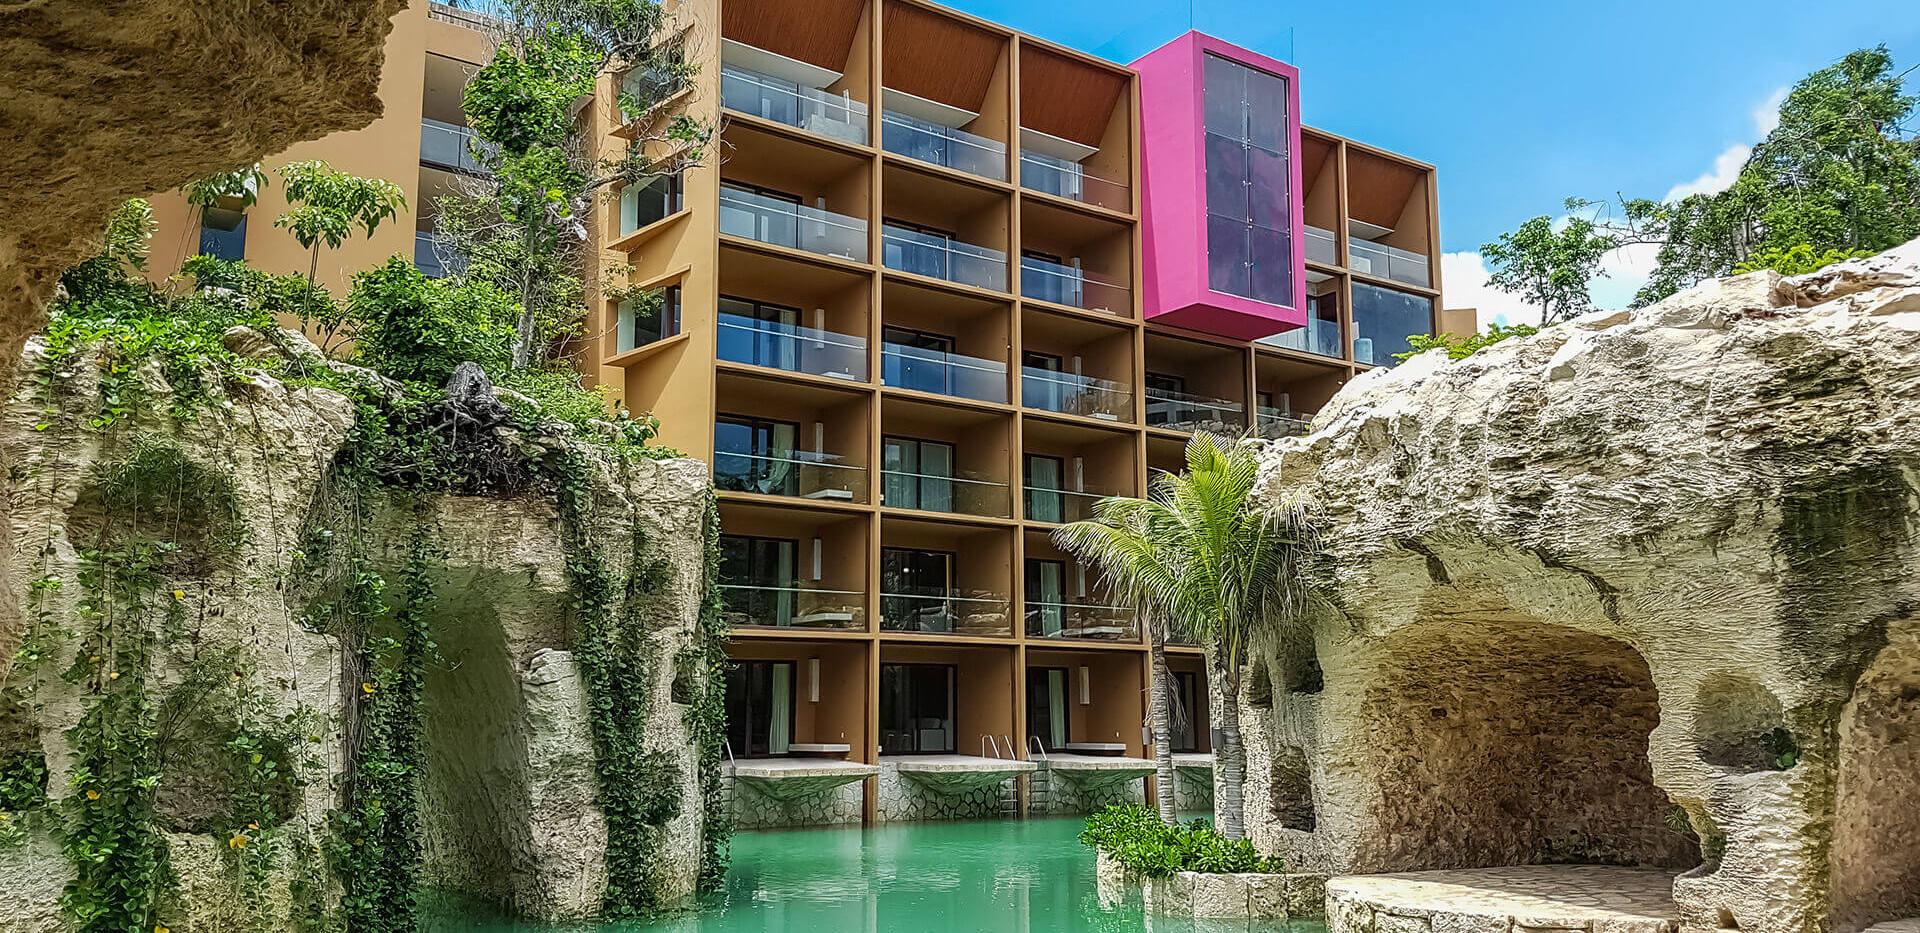 Hotel Xcaret-Espacios.jpg